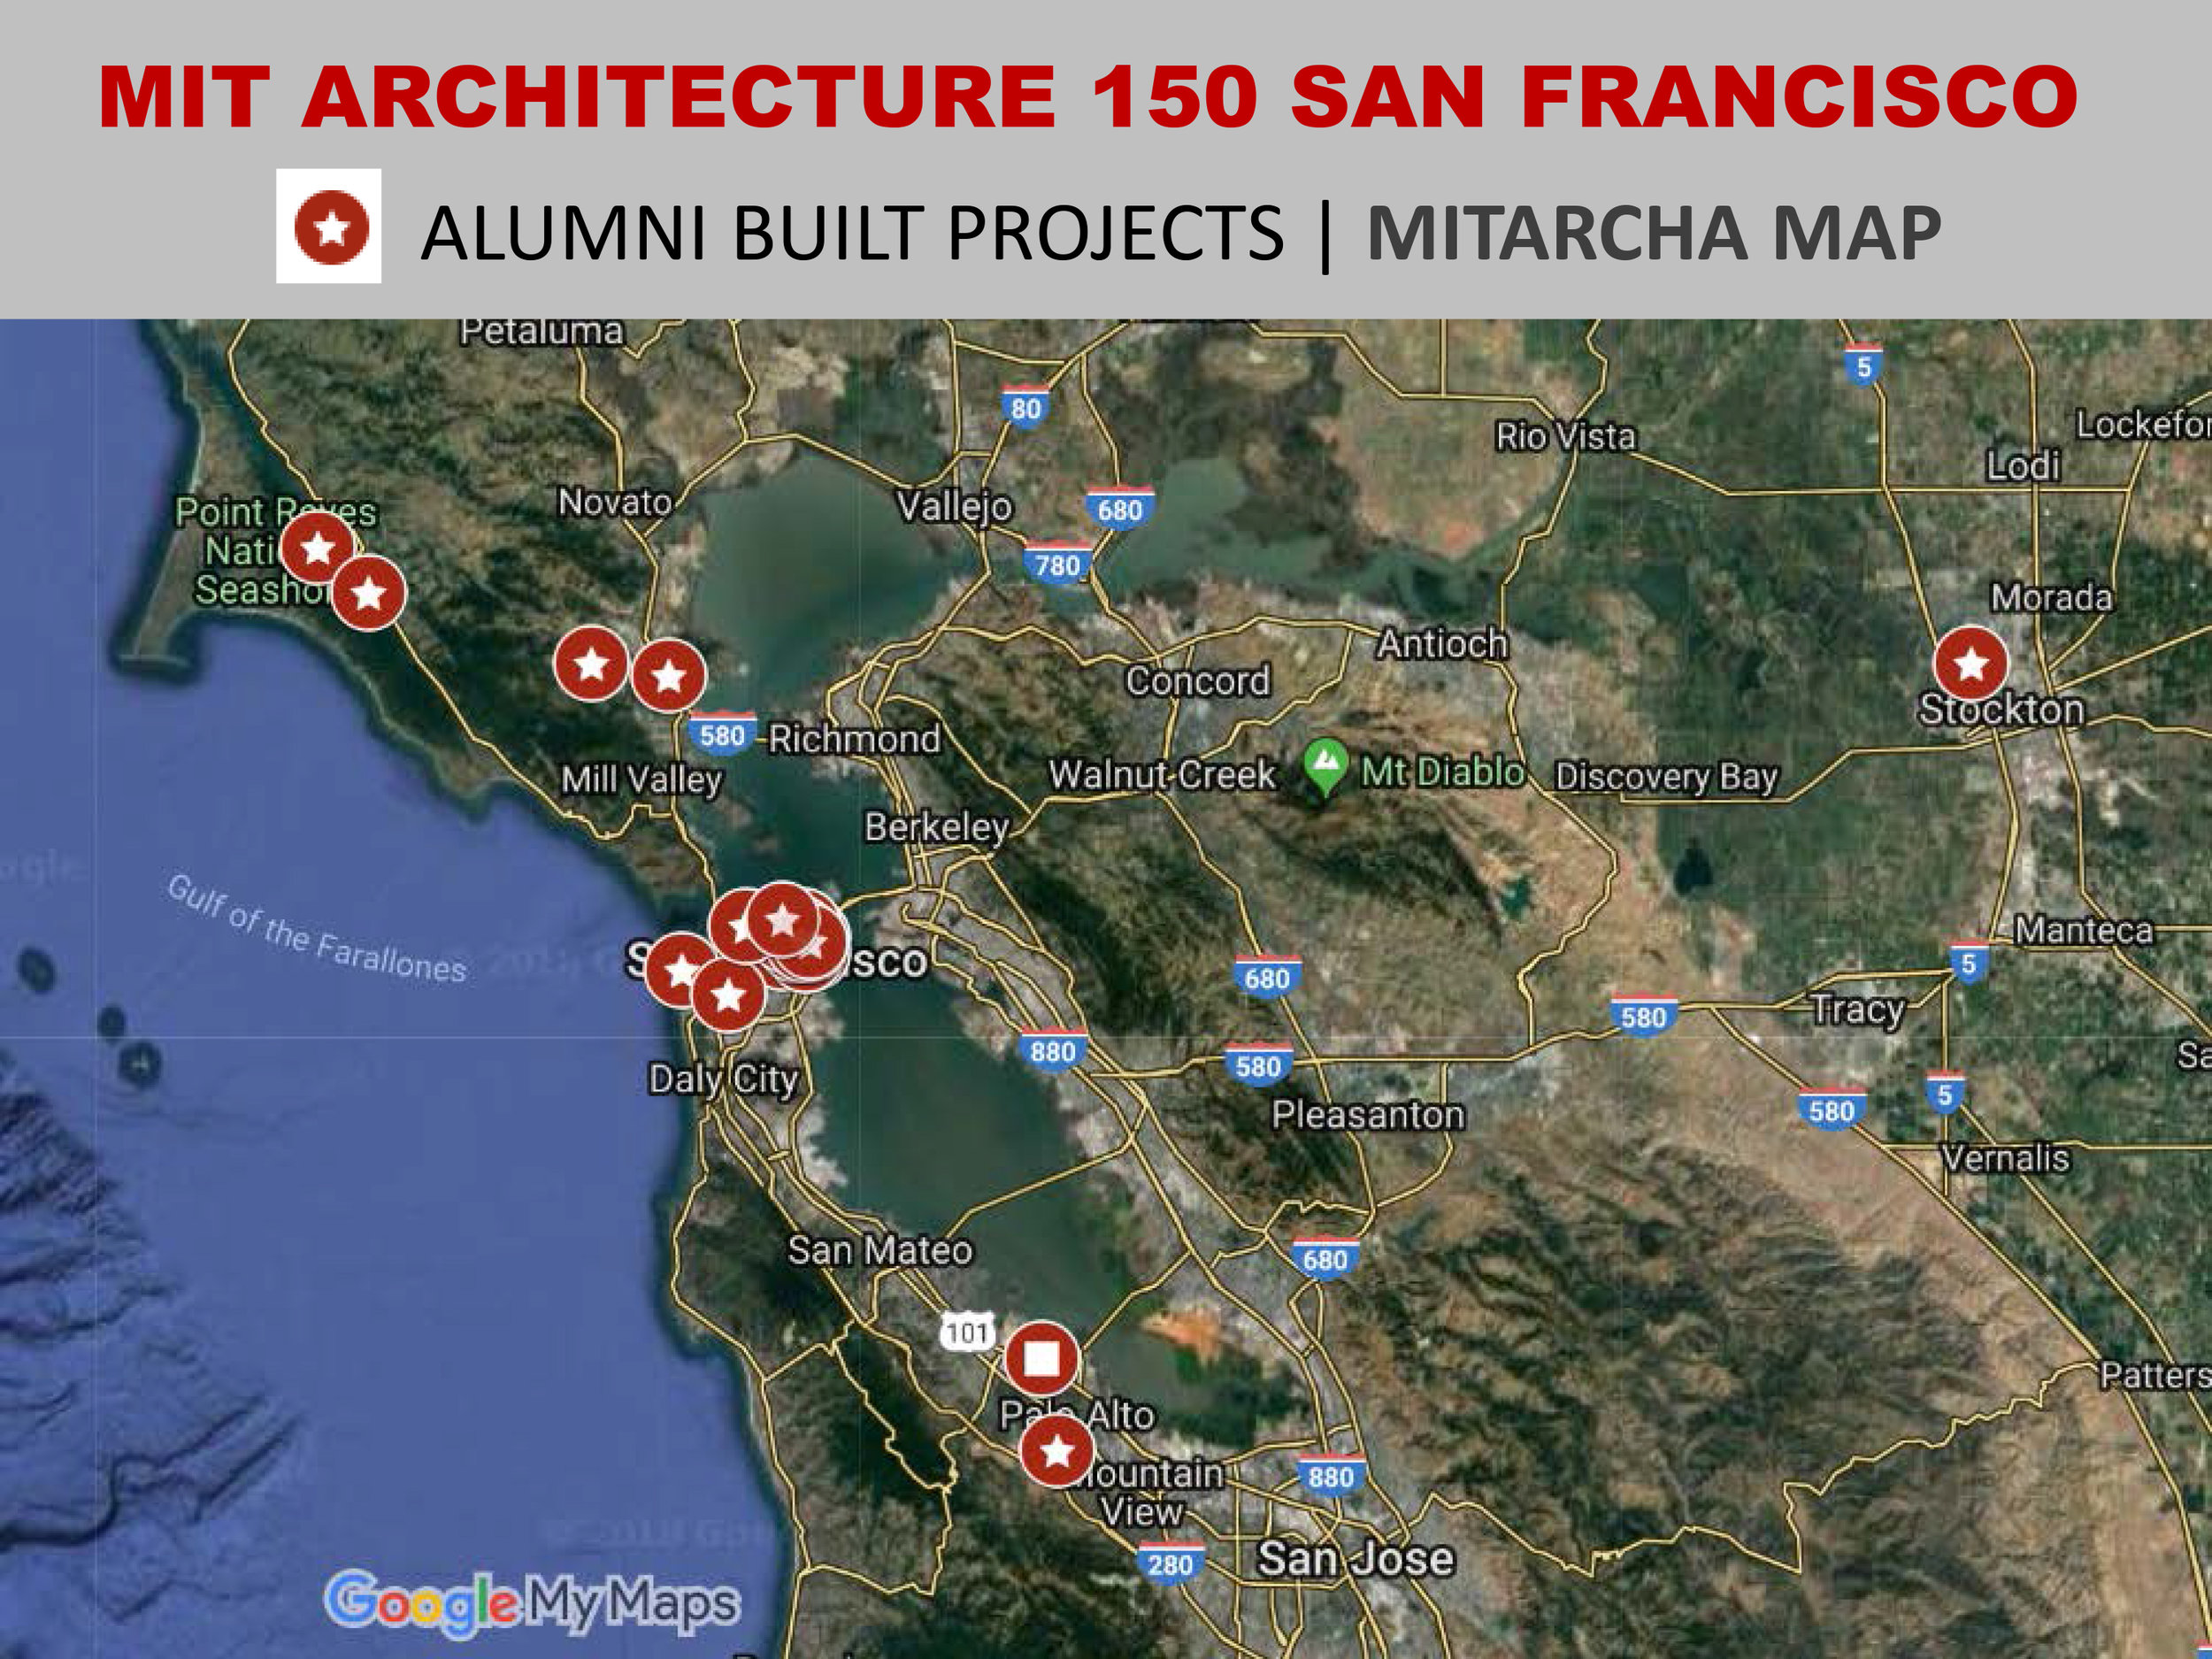 MIT ARCHITECTURE 150 SAN FRANCISCO SLIDESHOW-57 copy.jpg